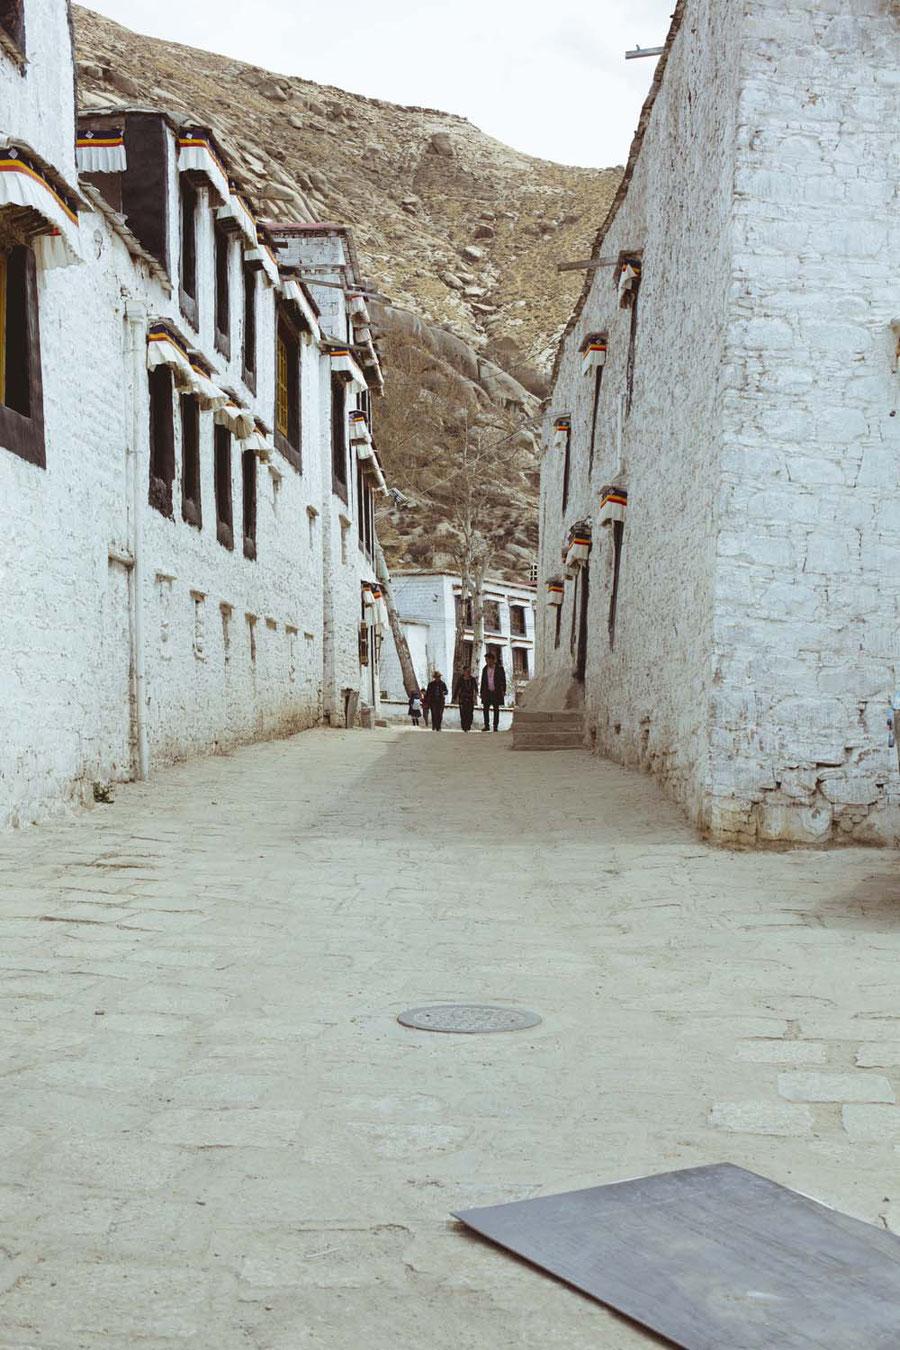 Sera Monastery, on the outskirts of Lhasa, Tibet, China